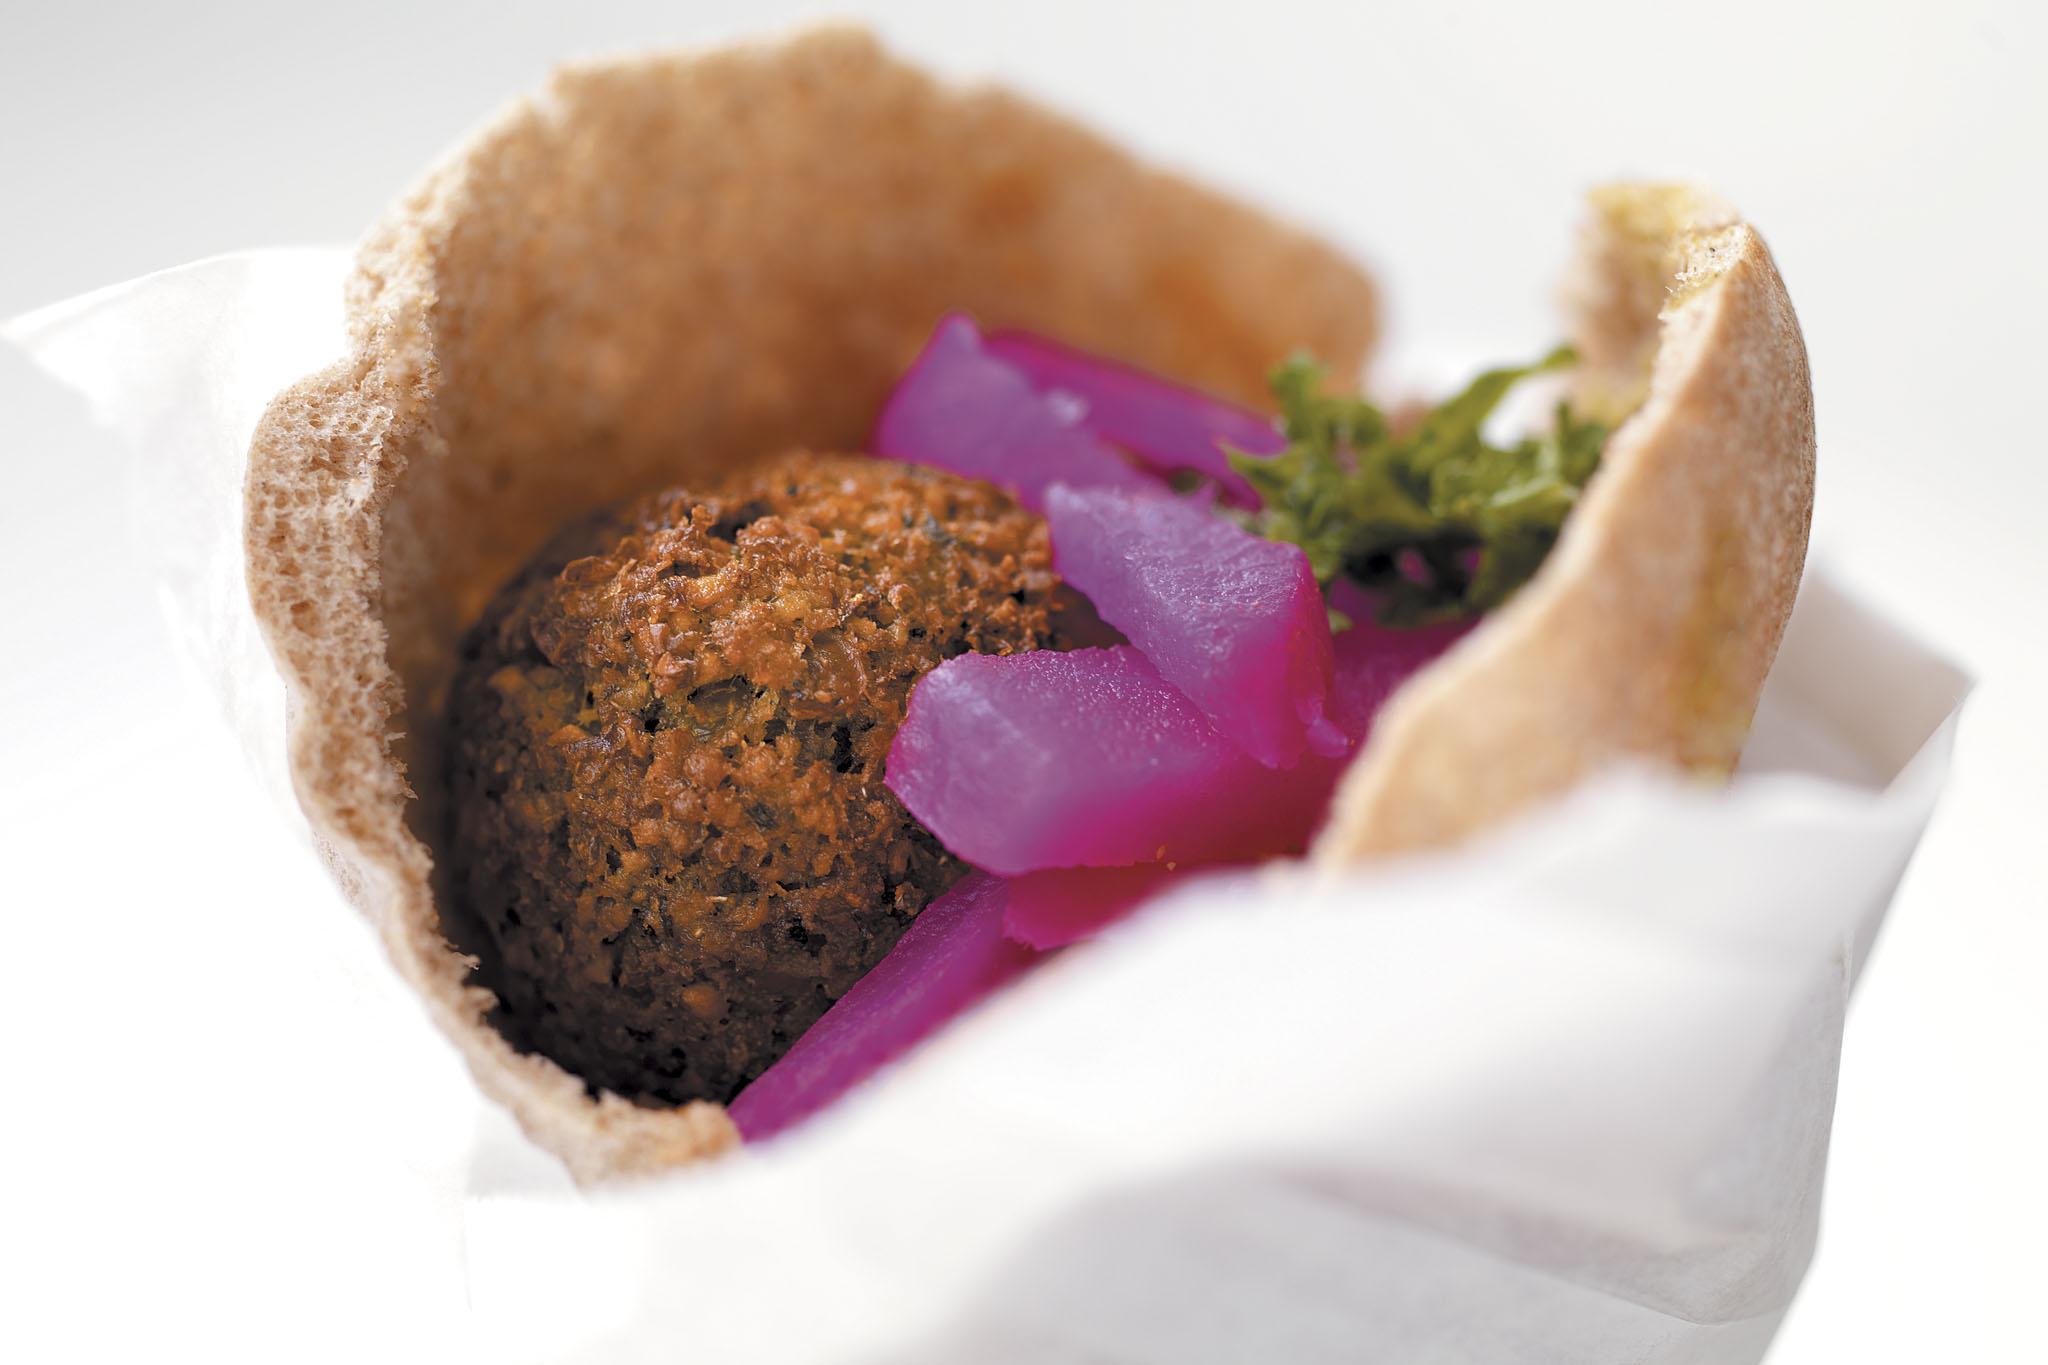 Best Middle Eastern restaurants